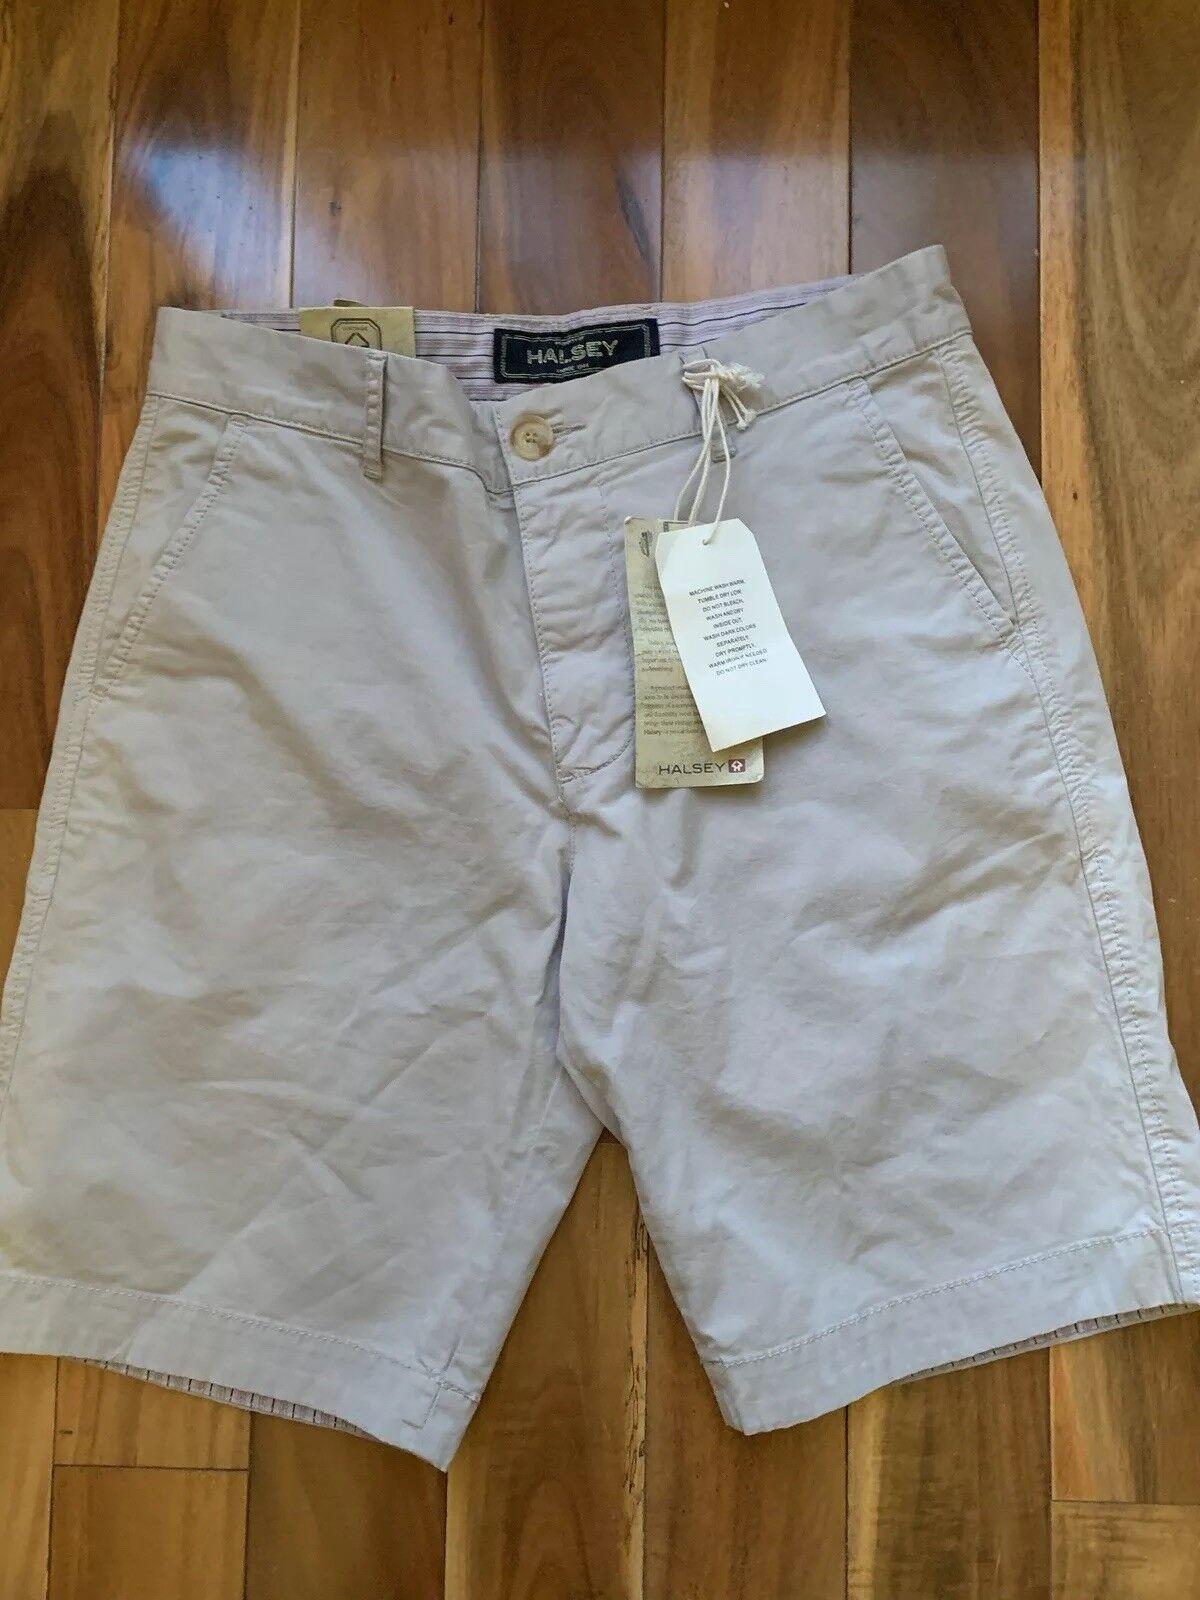 Halsey 44 Khaki Shorts  NEw With Tags   size 33